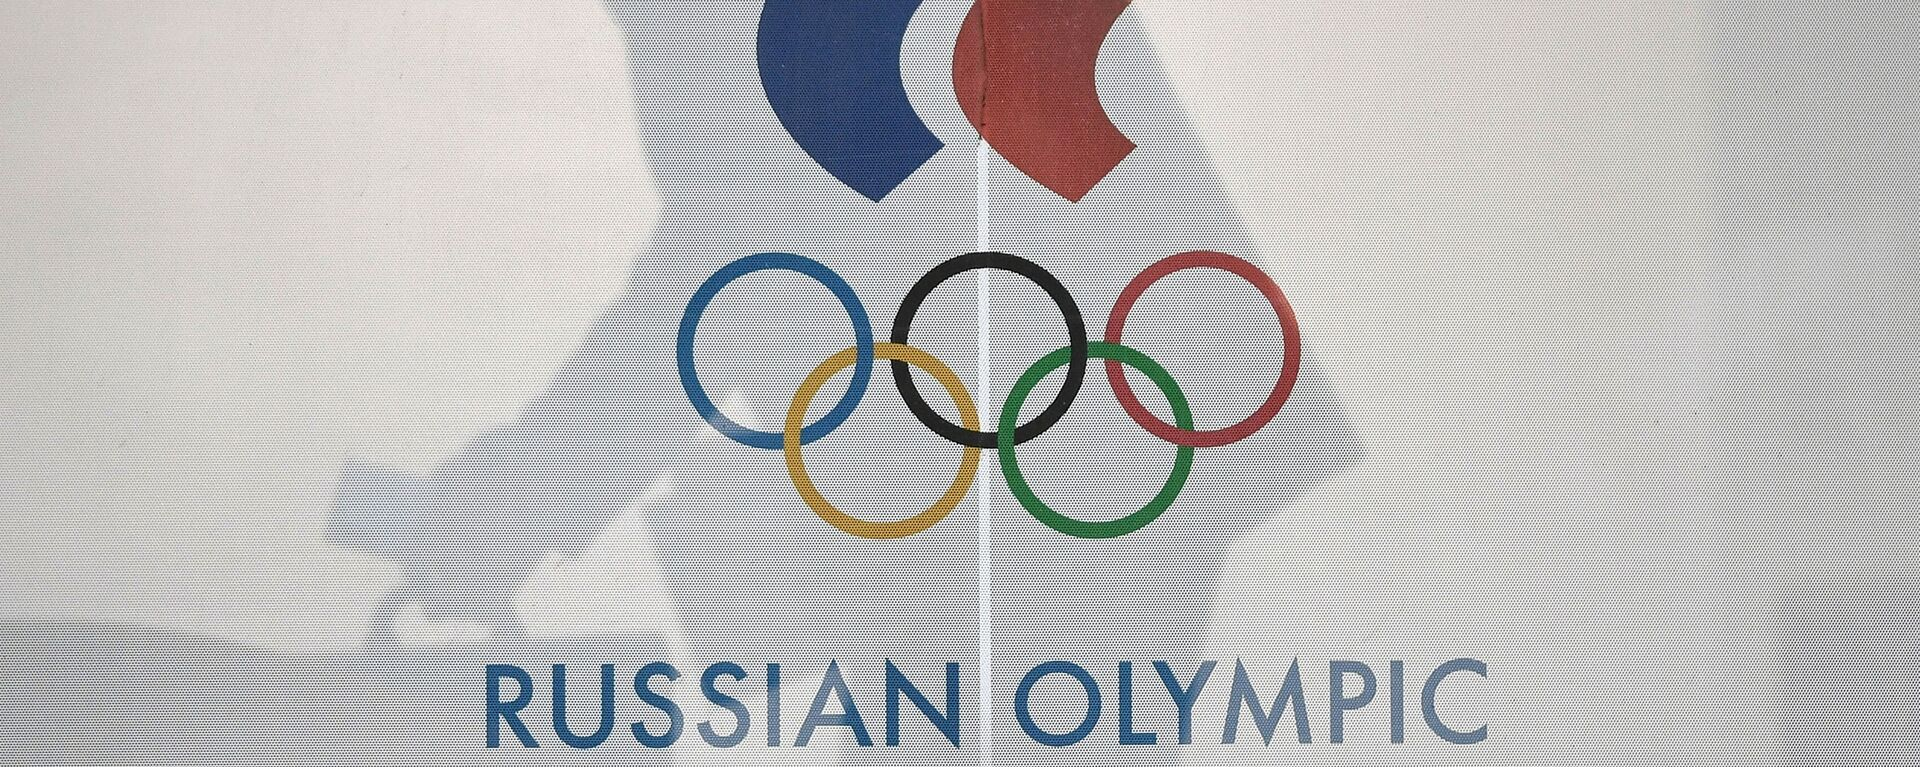 Руски олимпијски комитет - Sputnik Србија, 1920, 20.02.2021